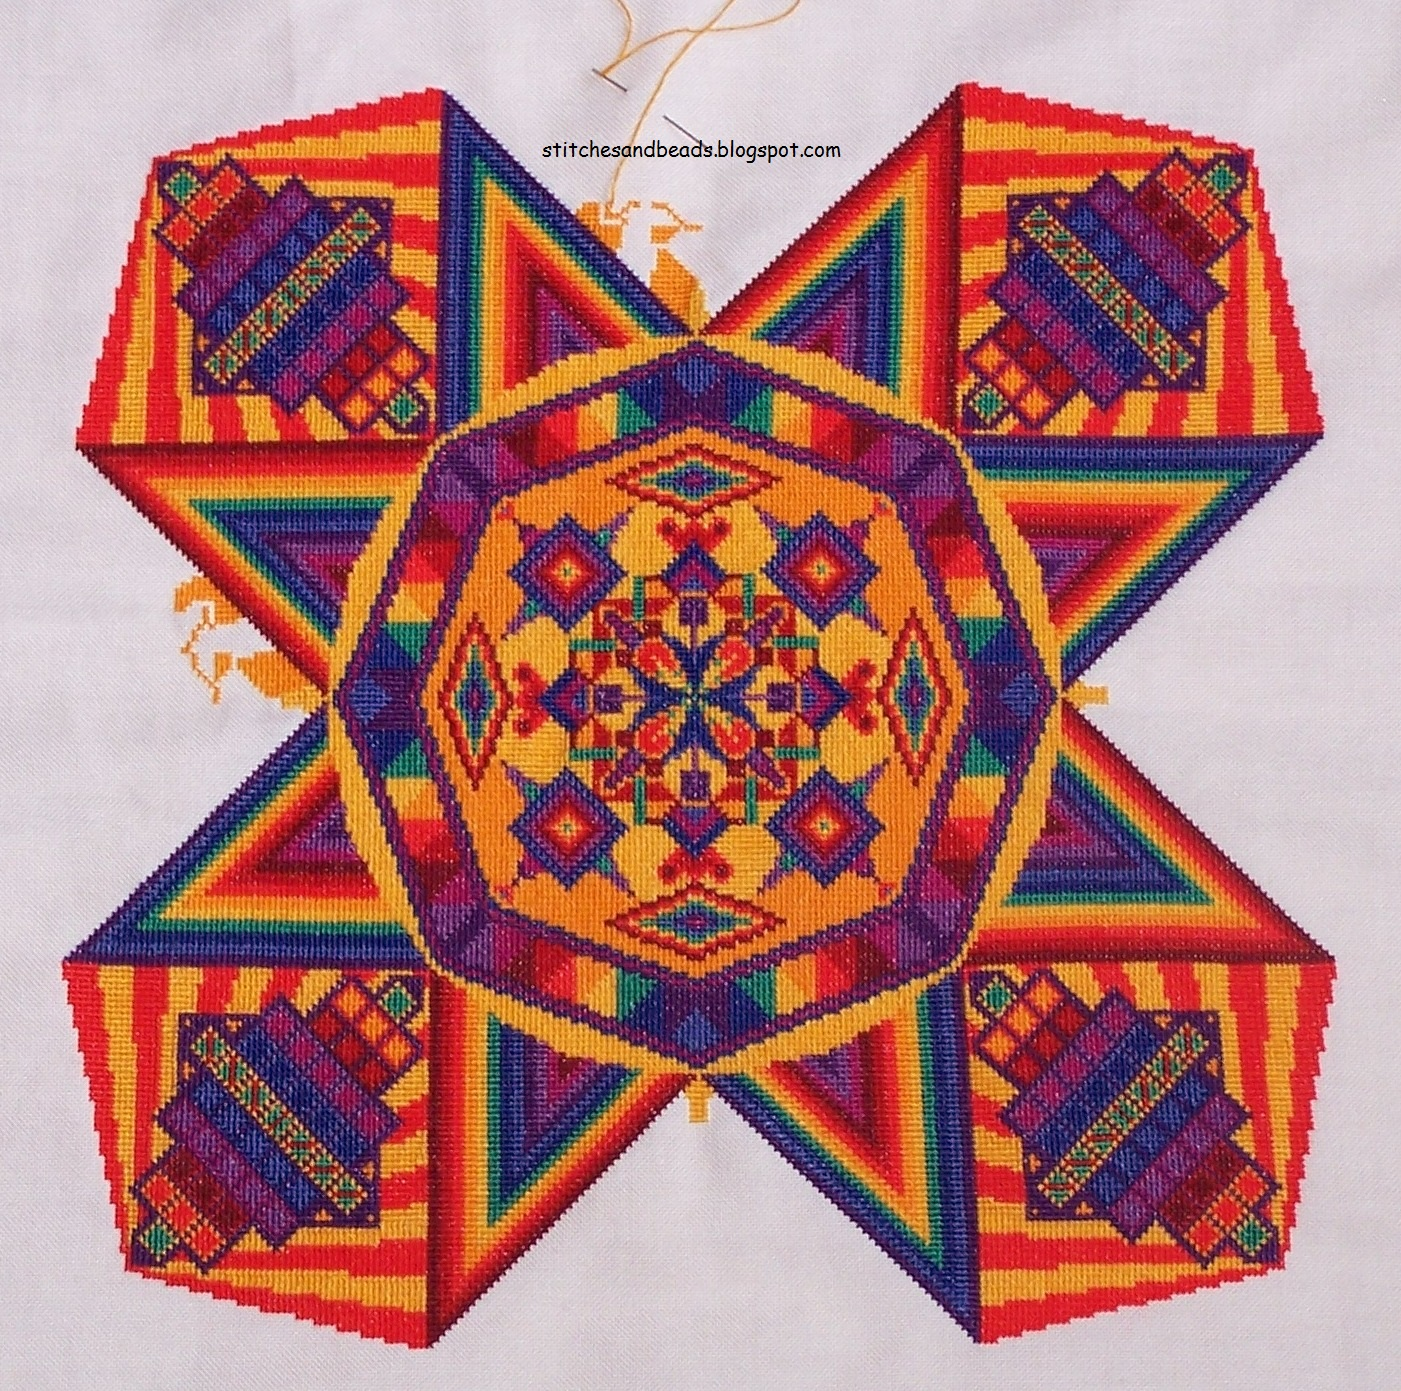 Weer Een Stapje Verder: Stitches And Beads: Mandala Stephanie Gevers-weer Een